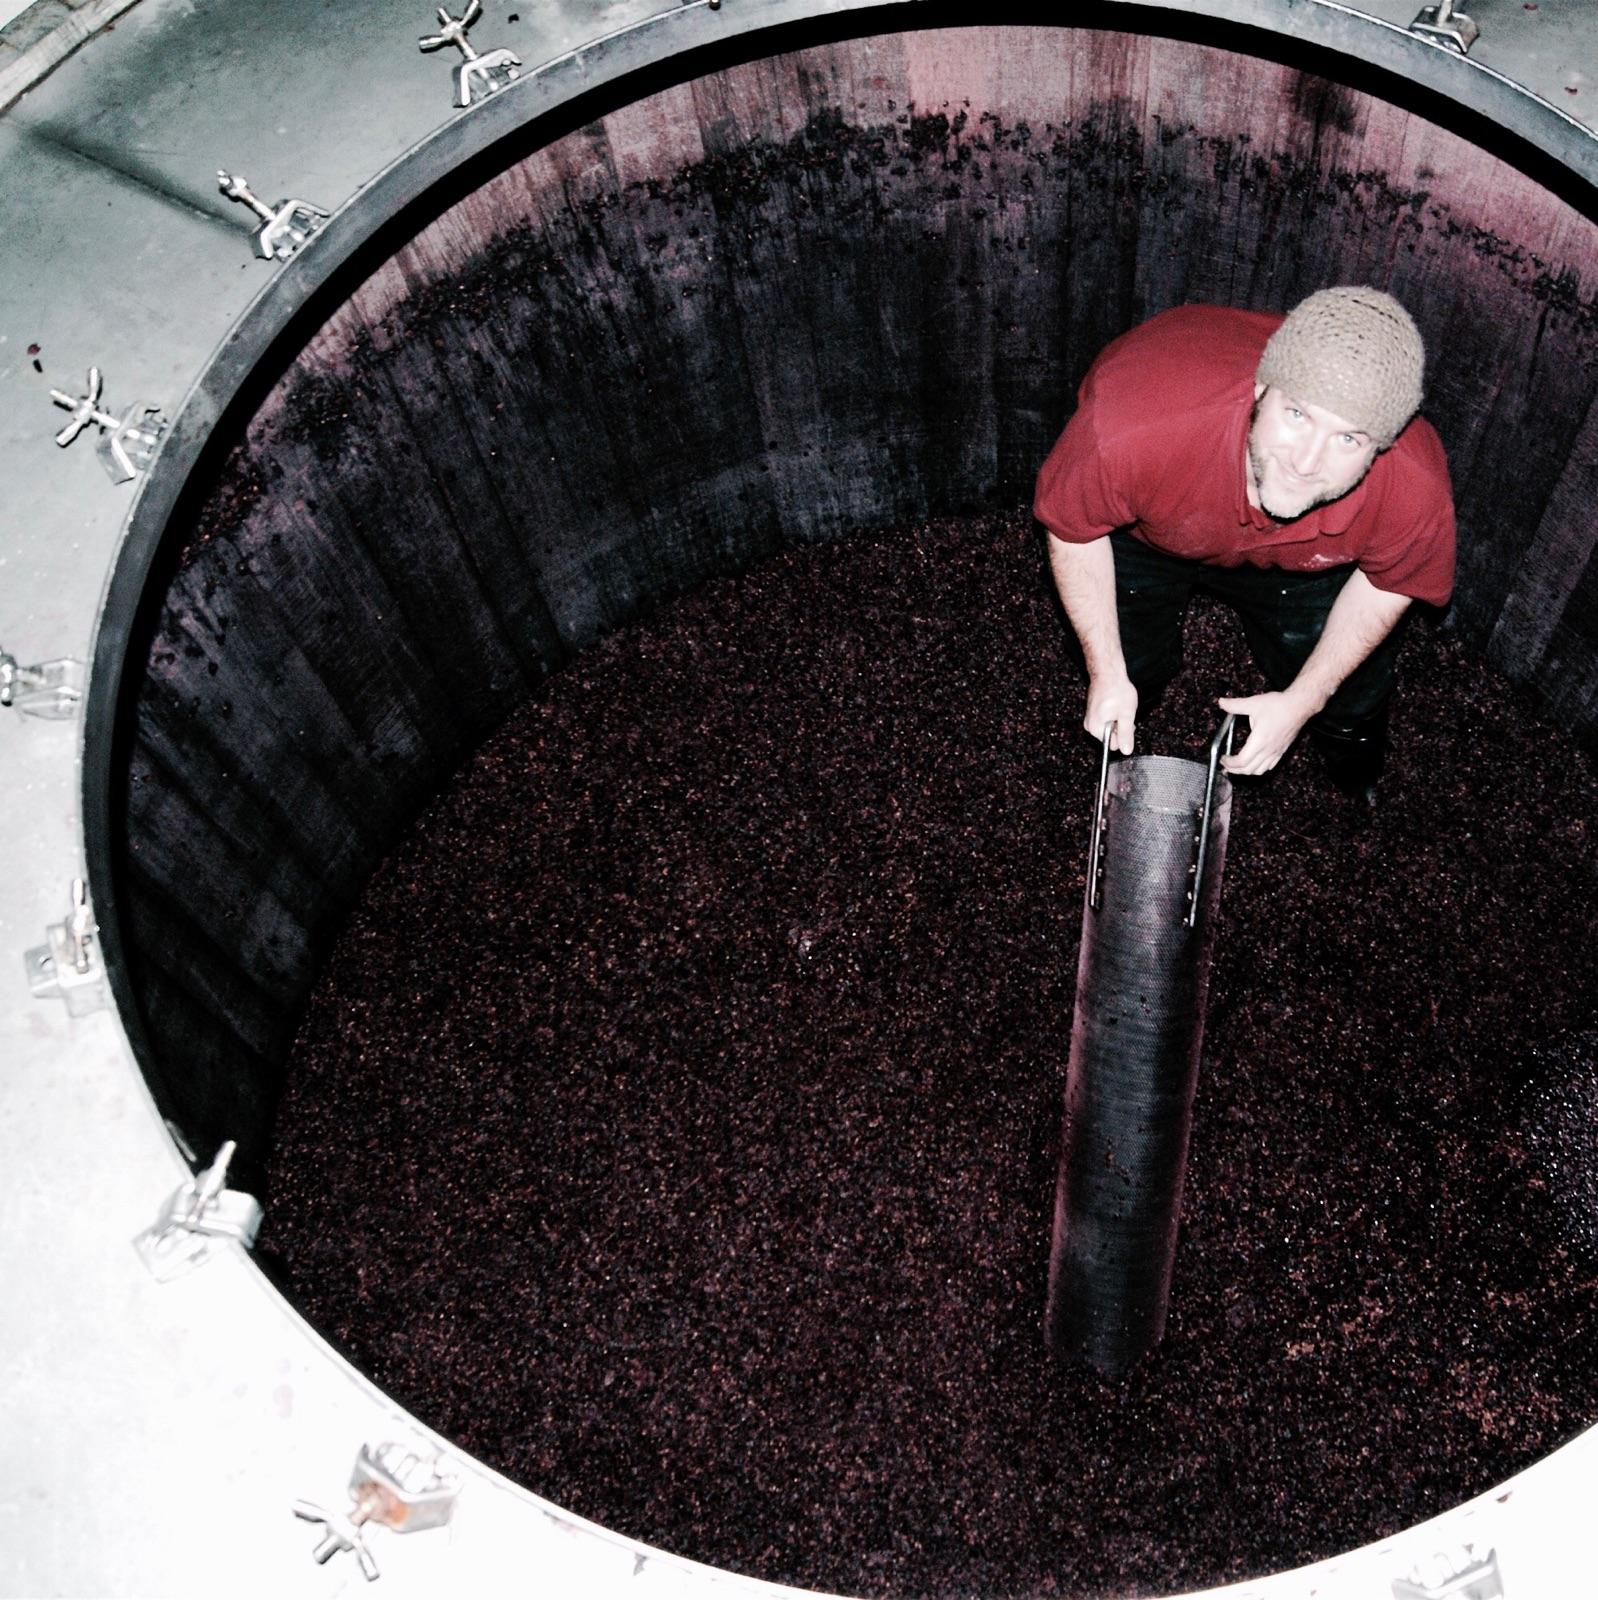 Michael lundeen - Winemaker / GM(503) 472-3215mlundeen@walnutcitywineworks.com